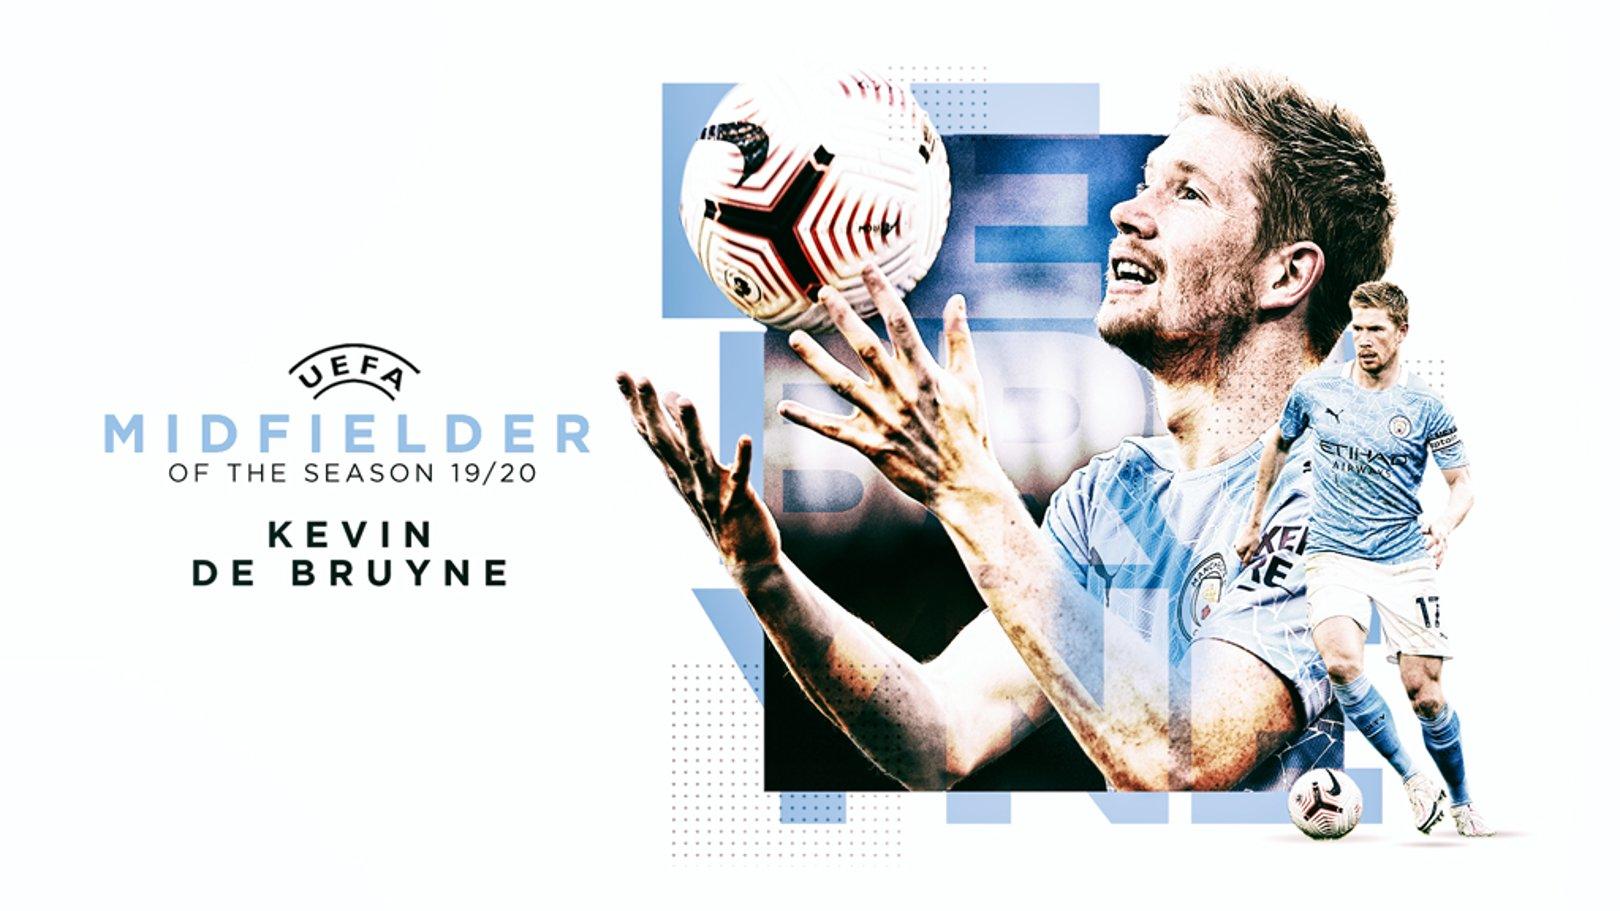 UEFA 이번 시즌의 미드필더에 뽑힌 데 브라위너